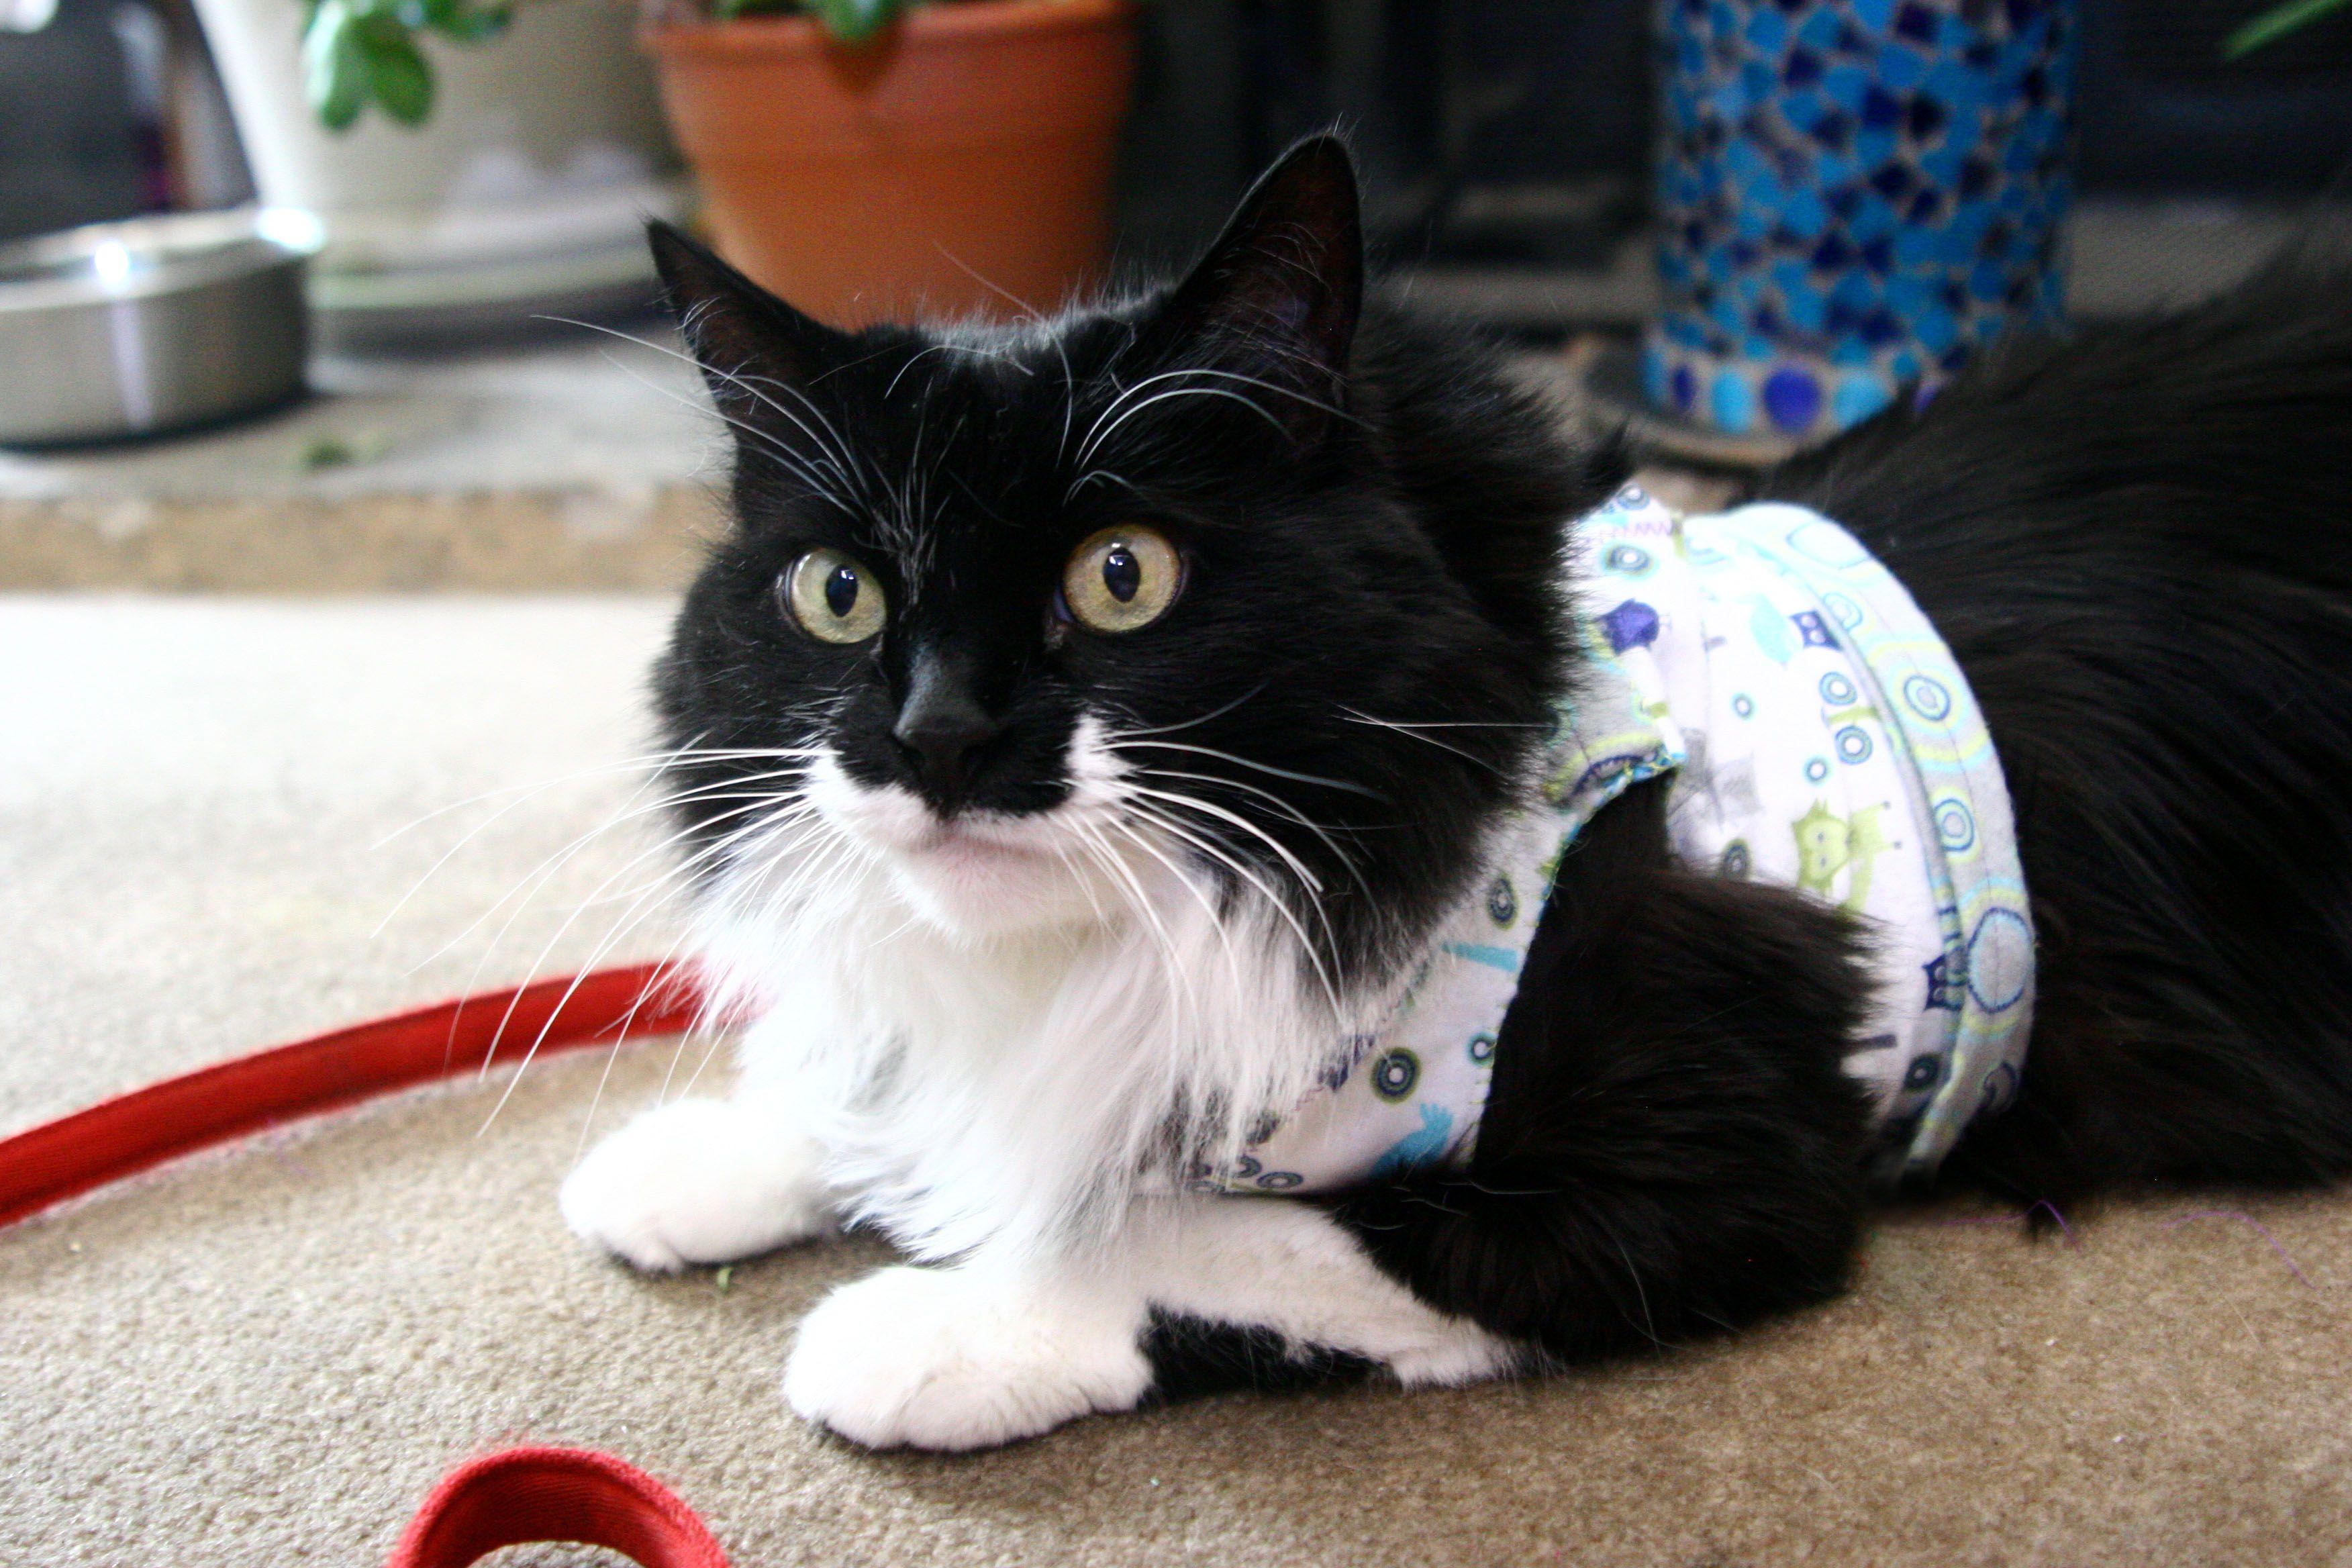 Homemade Cat Harness Cuteness Cat Harness Cats Cat Love